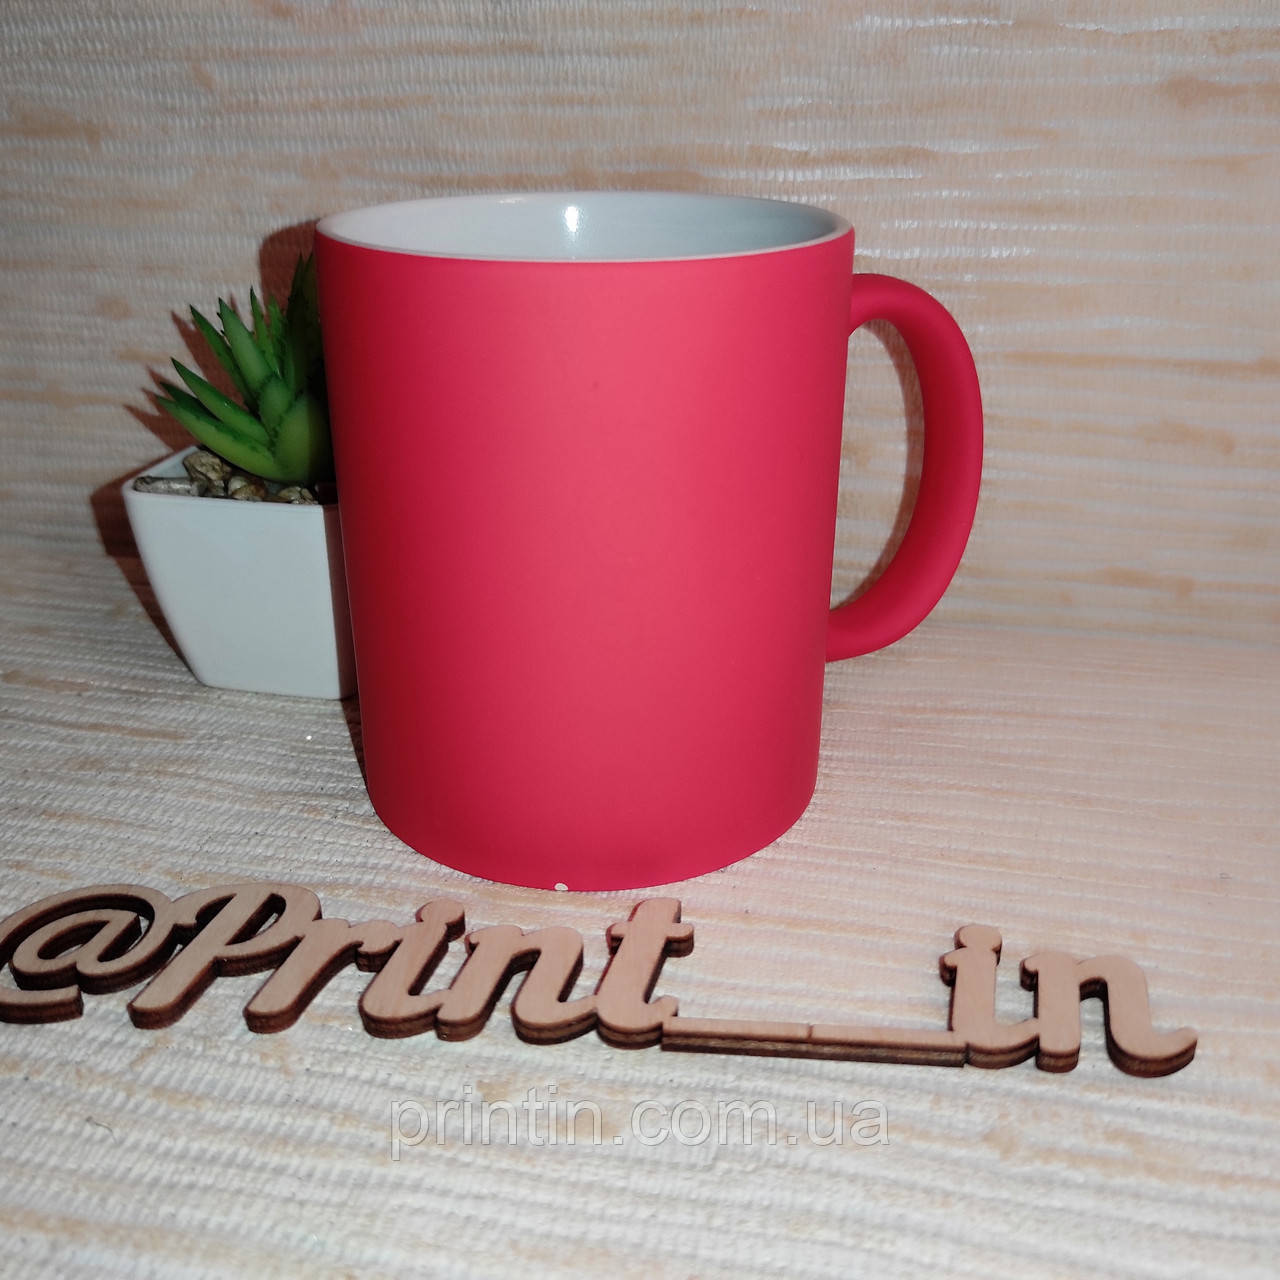 Красная неоновая чашка 330мл